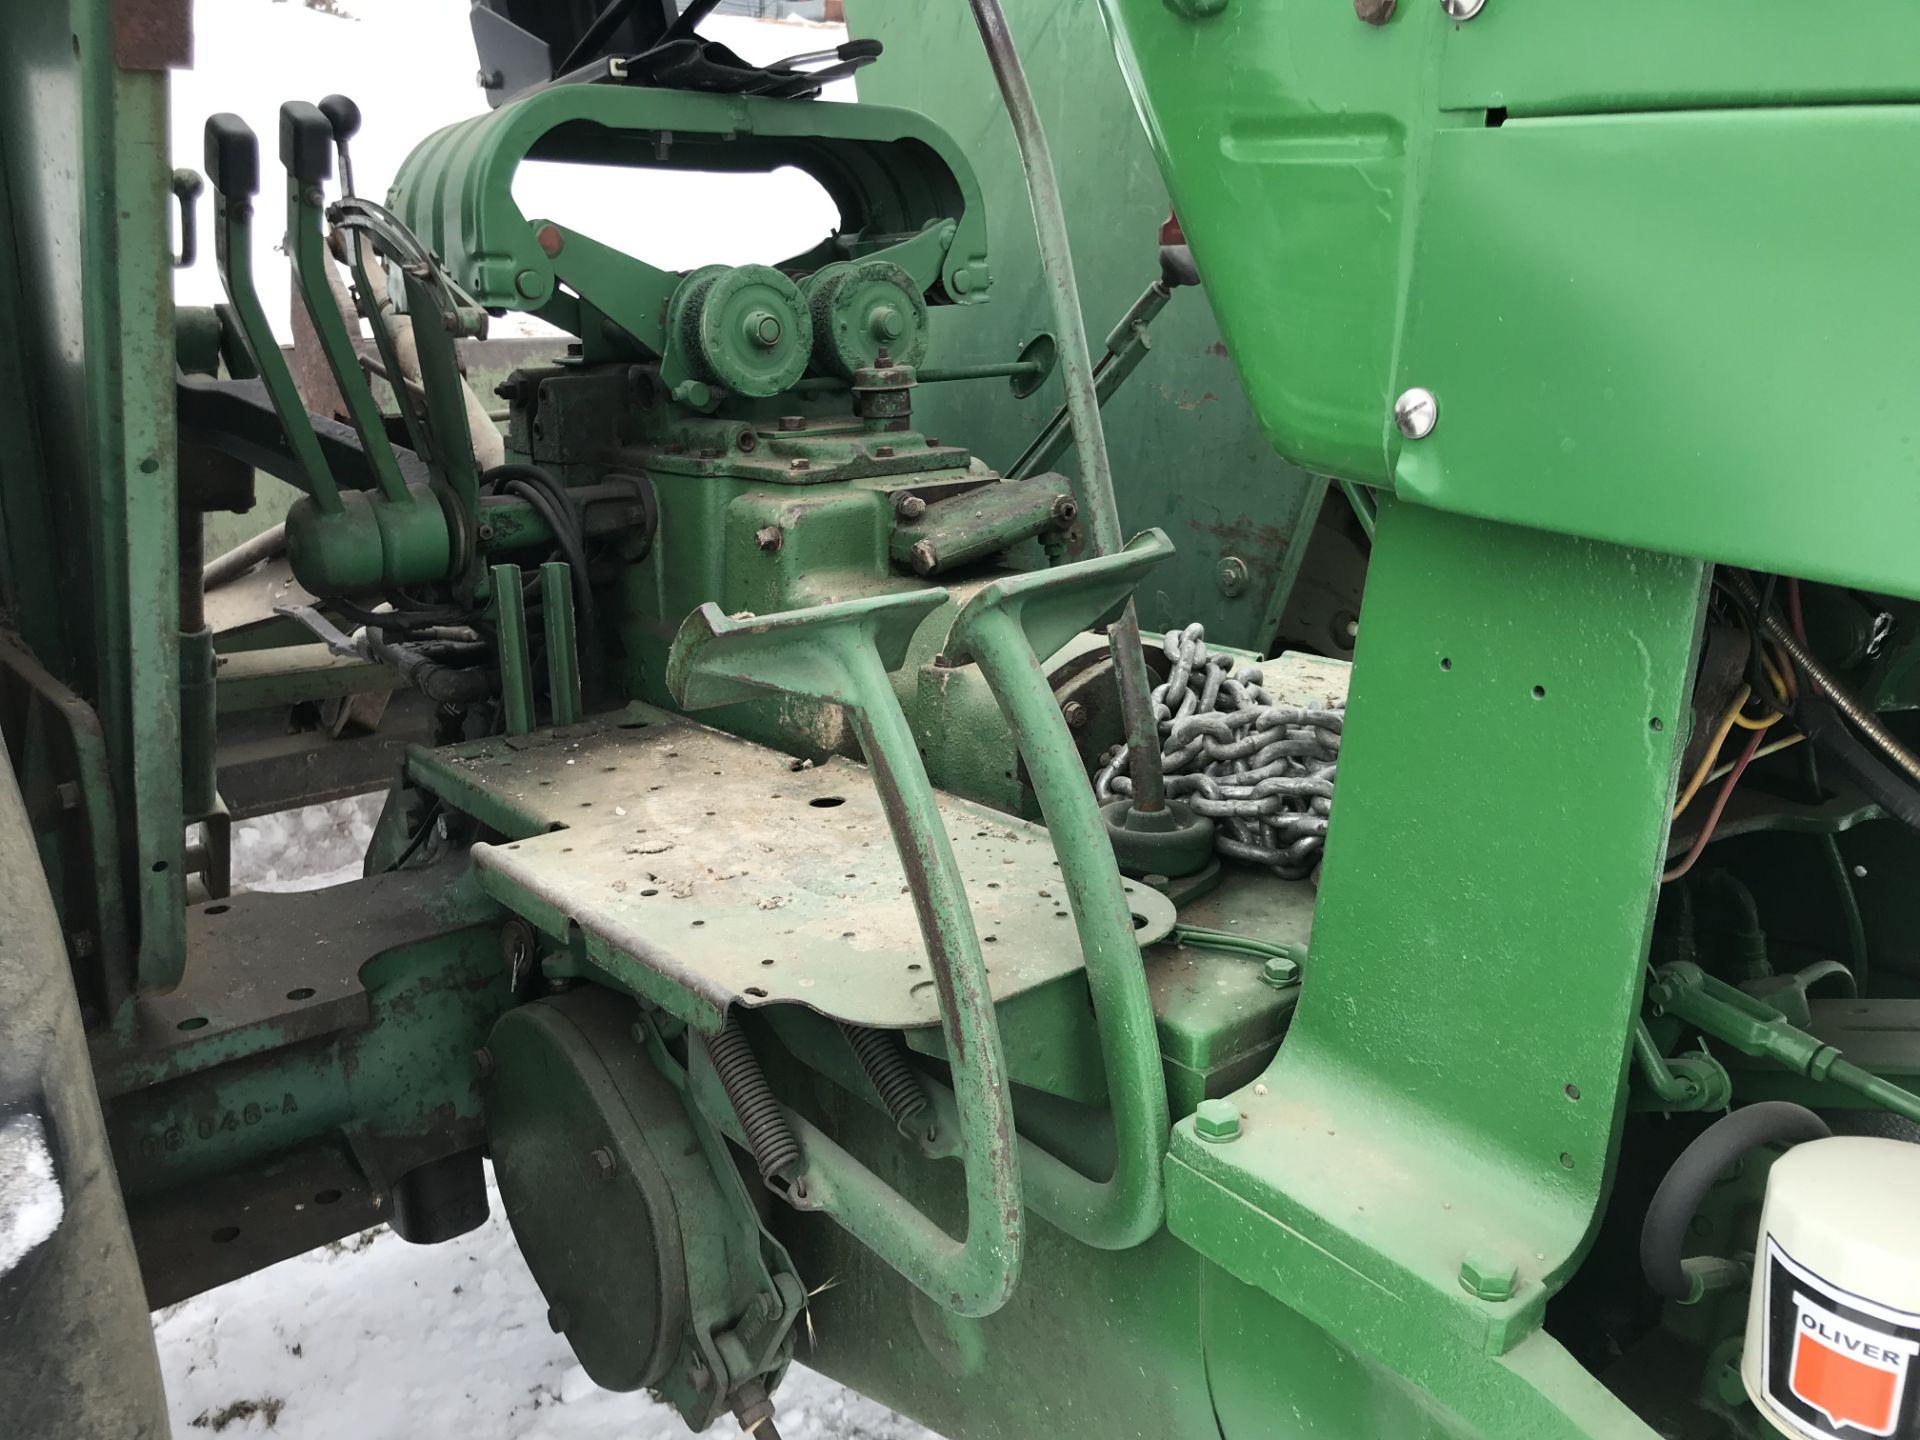 Lot 22 - Mdl.1800 Diesel S#124-875-842, WF, 3pt, Dual Hyd, Frt. Slab Wts, New Frt. Tires, 16.9x34 (rubber